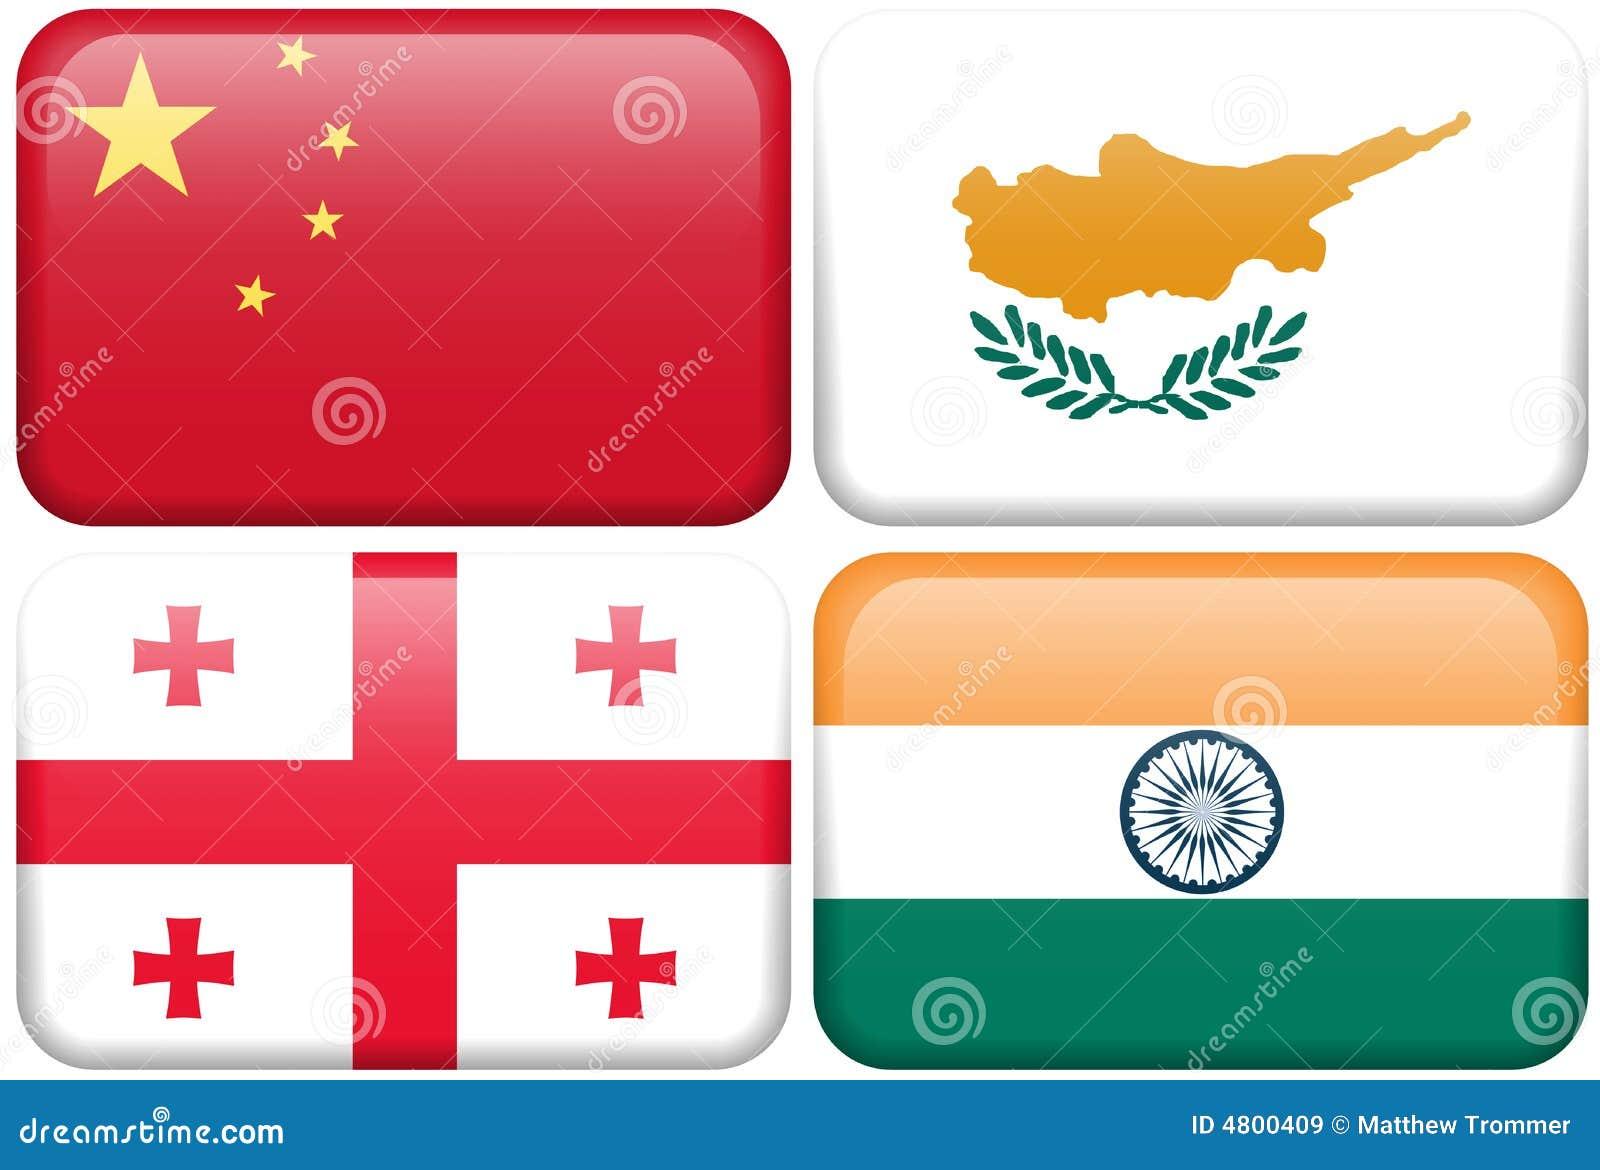 Download cyprus flag